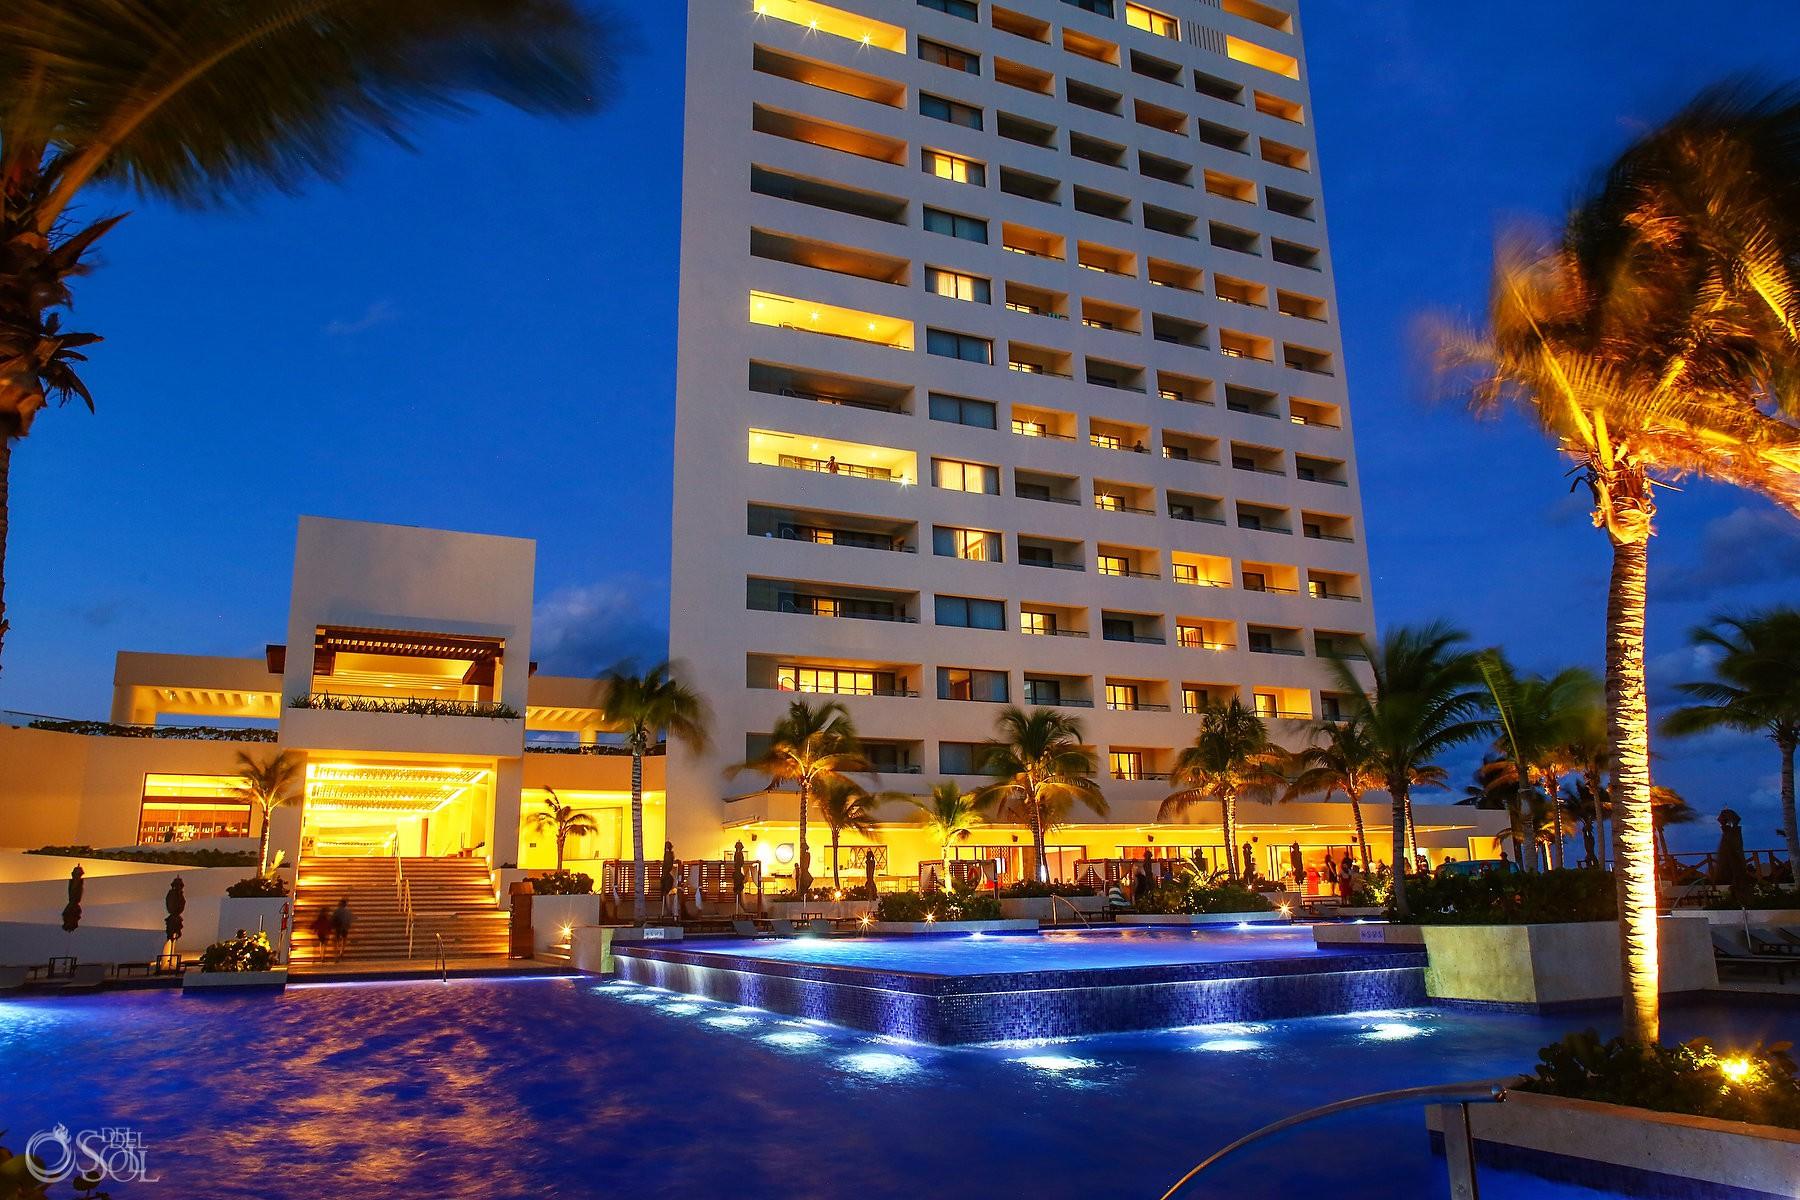 Dusk light in Hyatt Ziva Cancun, Luxury destination wedding venue